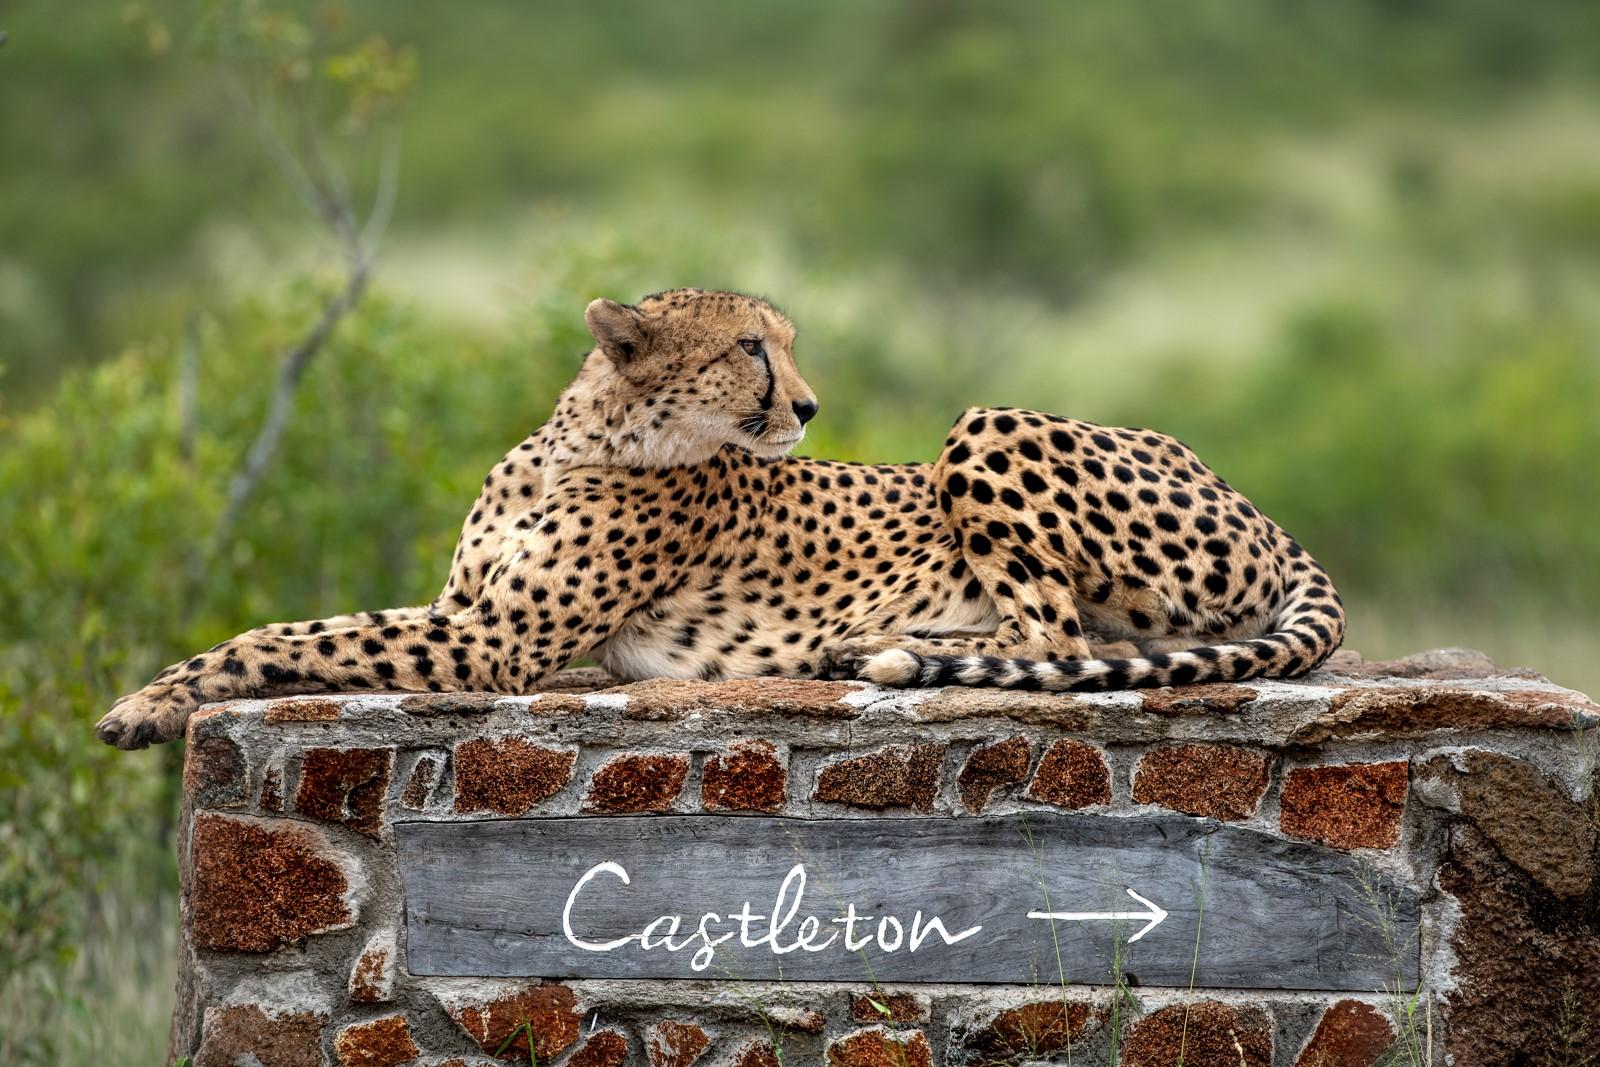 Castleton with cheetah